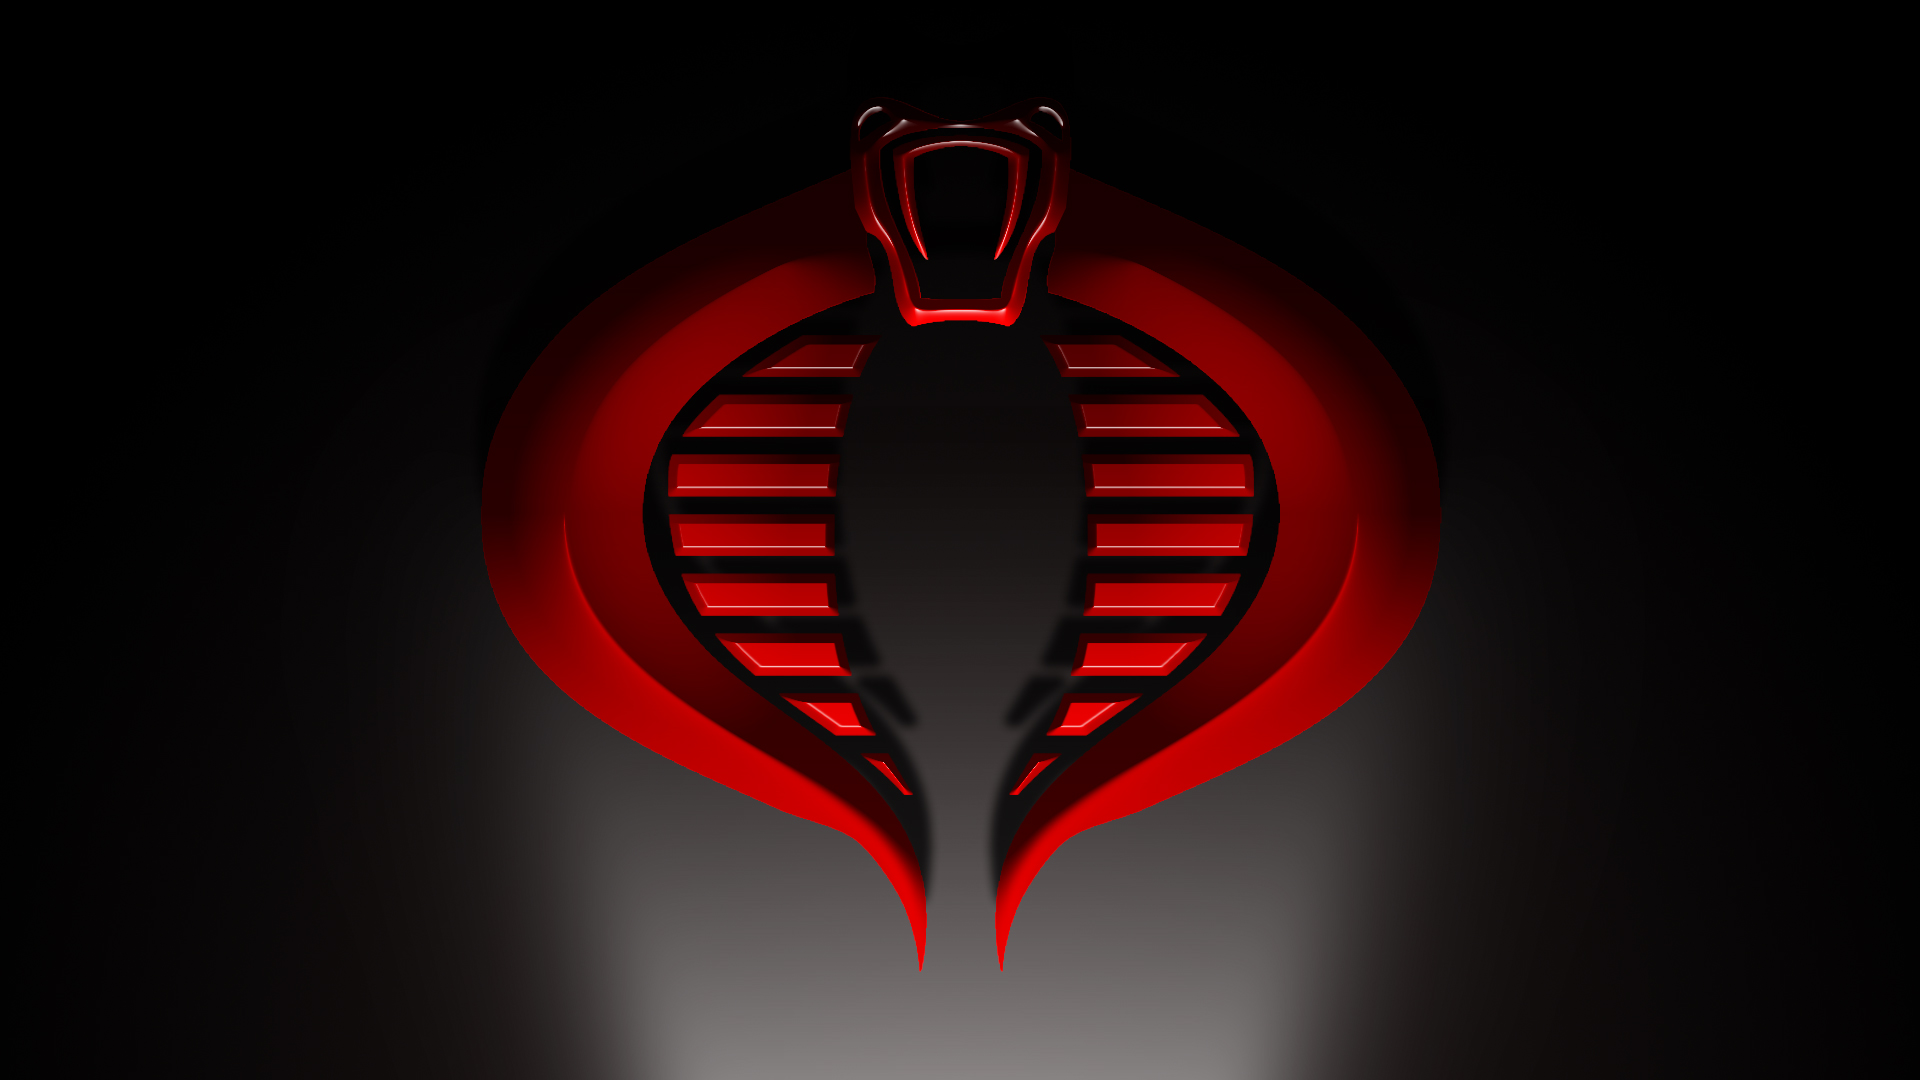 download Gi Joe Cobra Logos Cobra uplight by balsavor 1920x1080